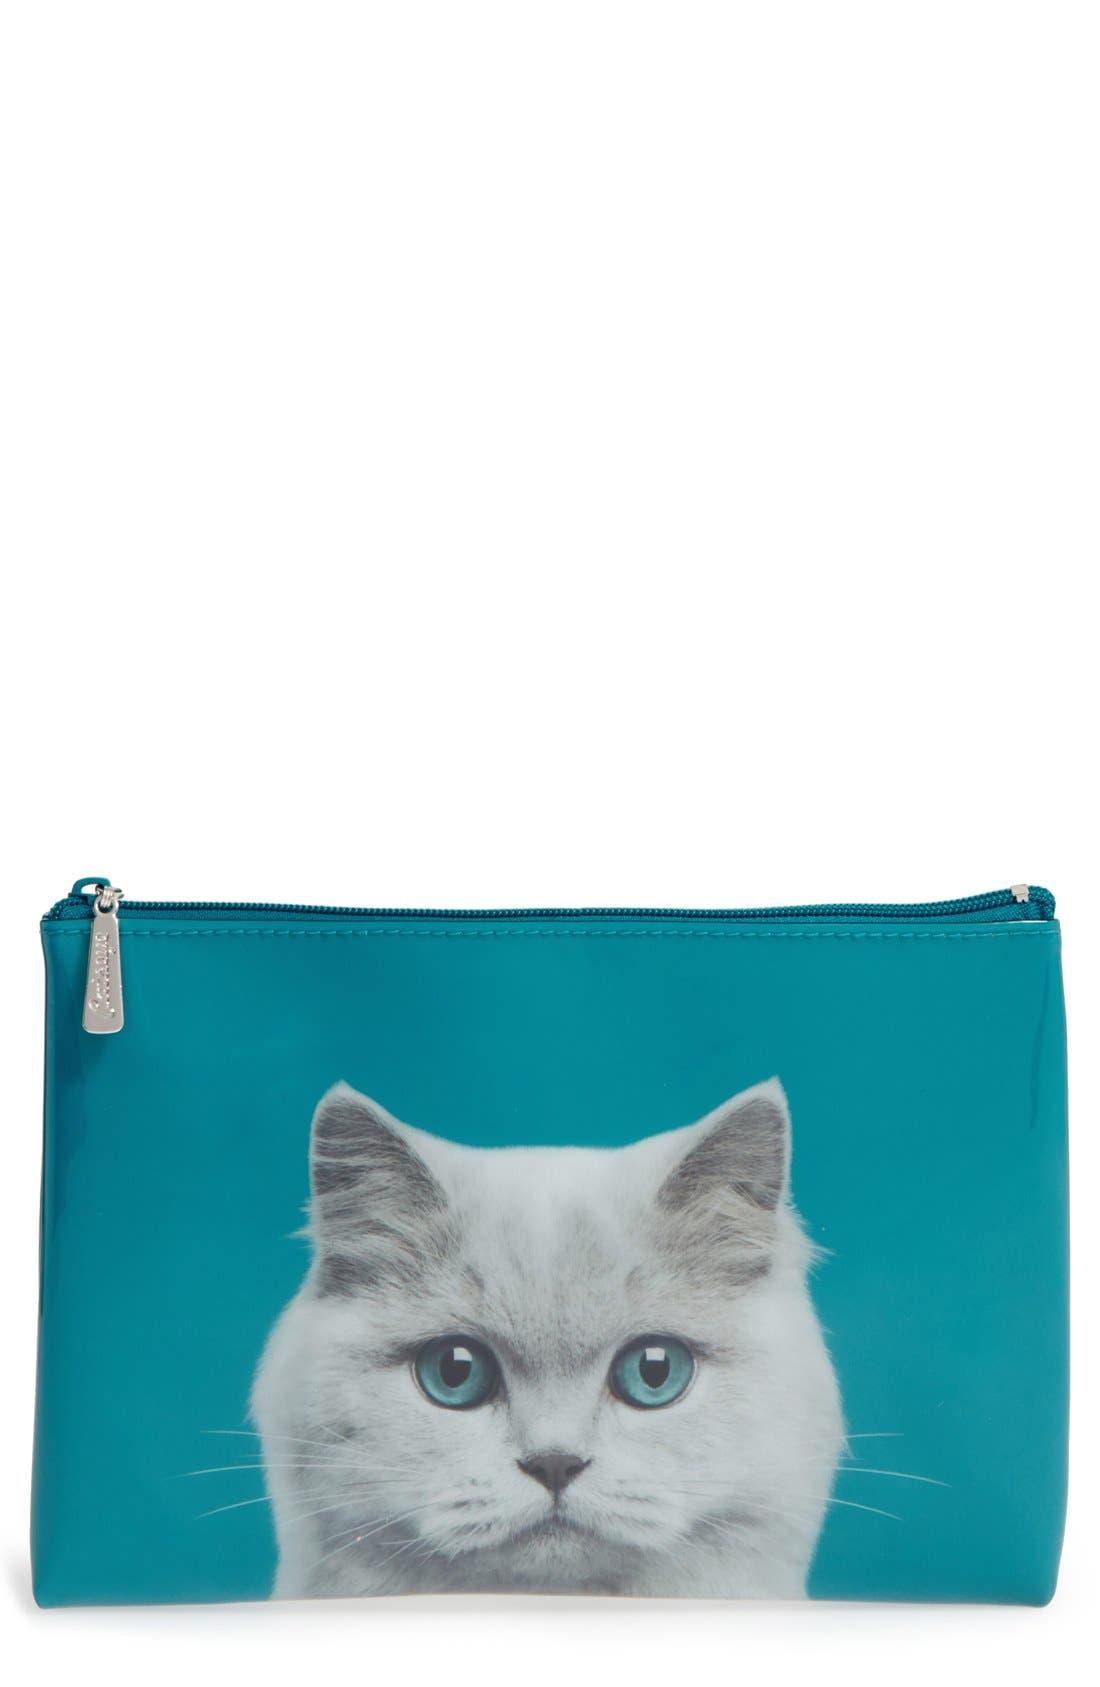 Main Image - Catseye London Large Cat Zip Pouch